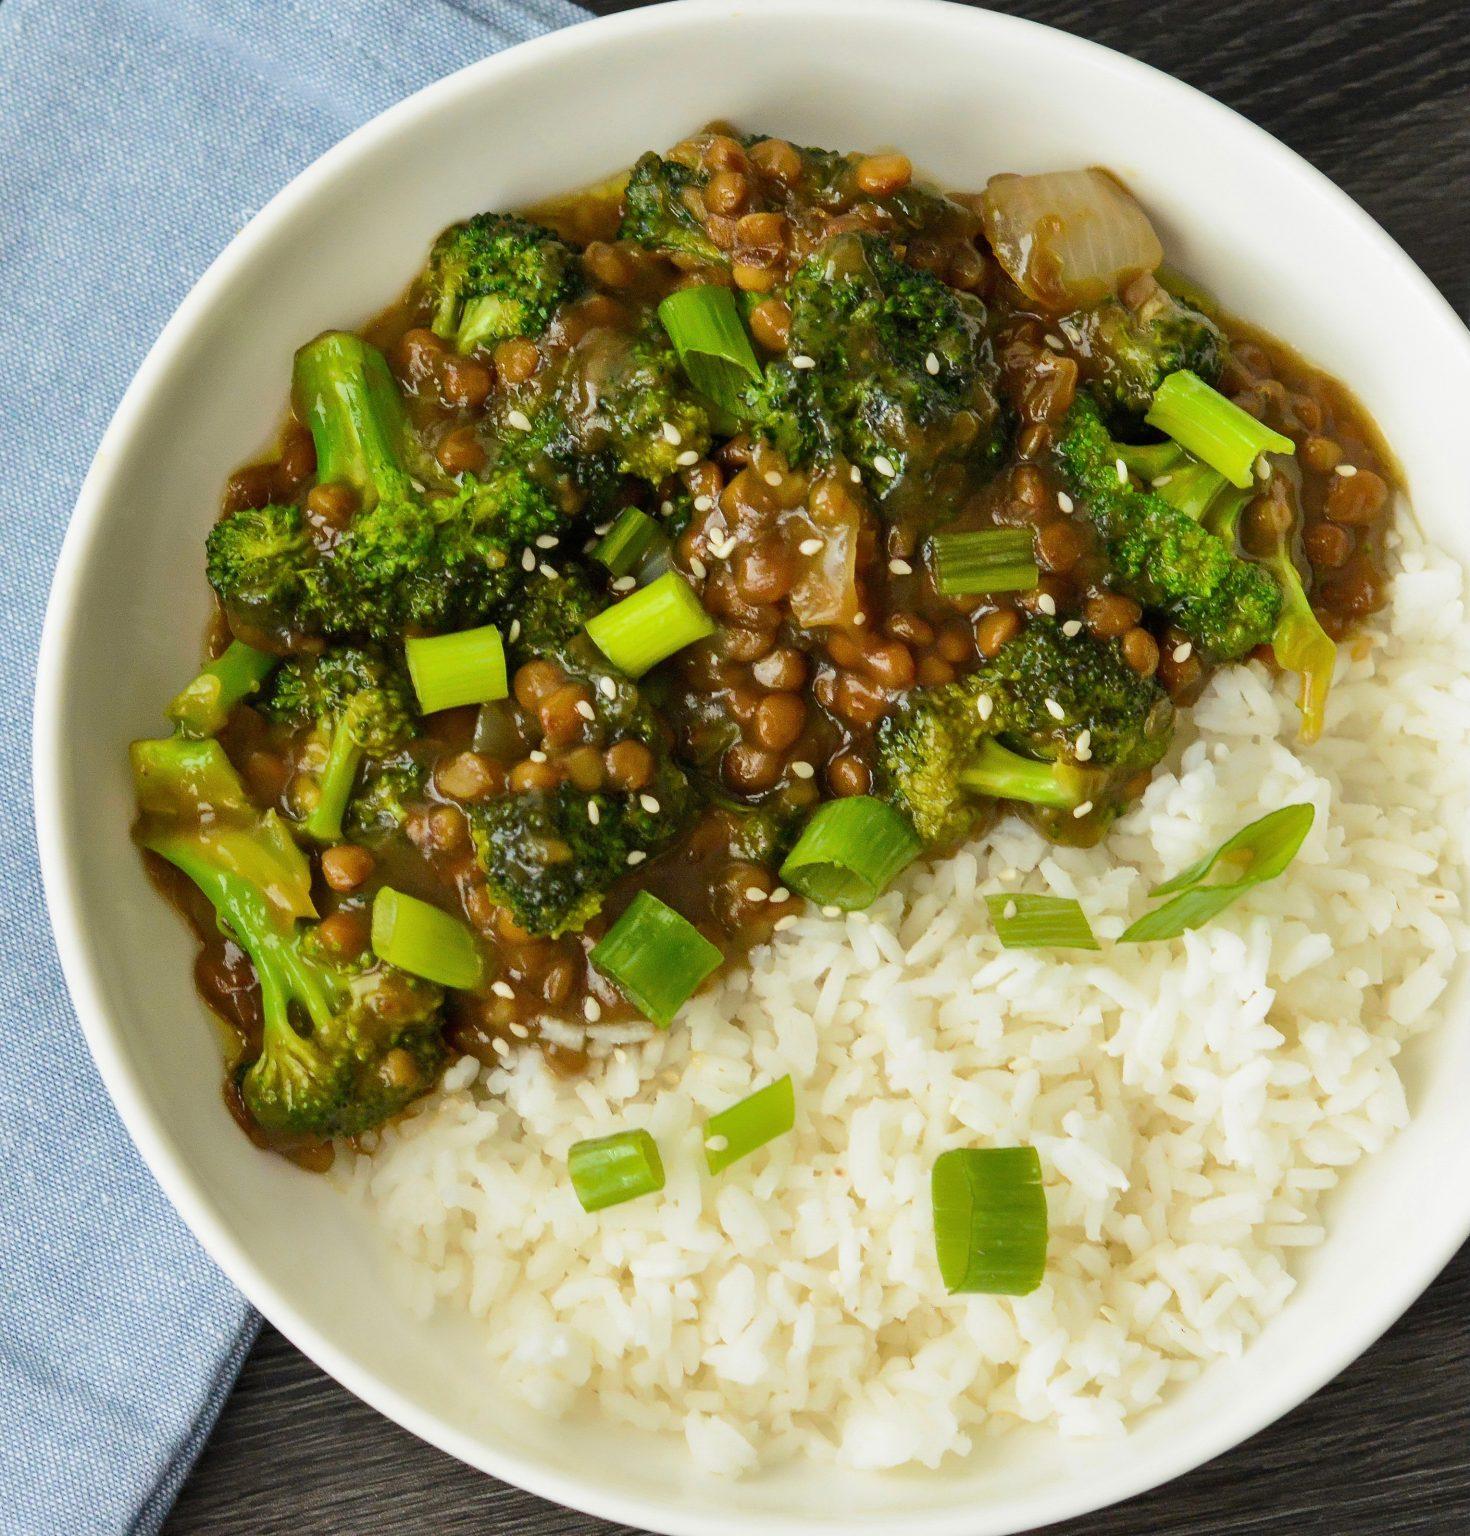 Vegan Mongolian Lentils & Broccoli